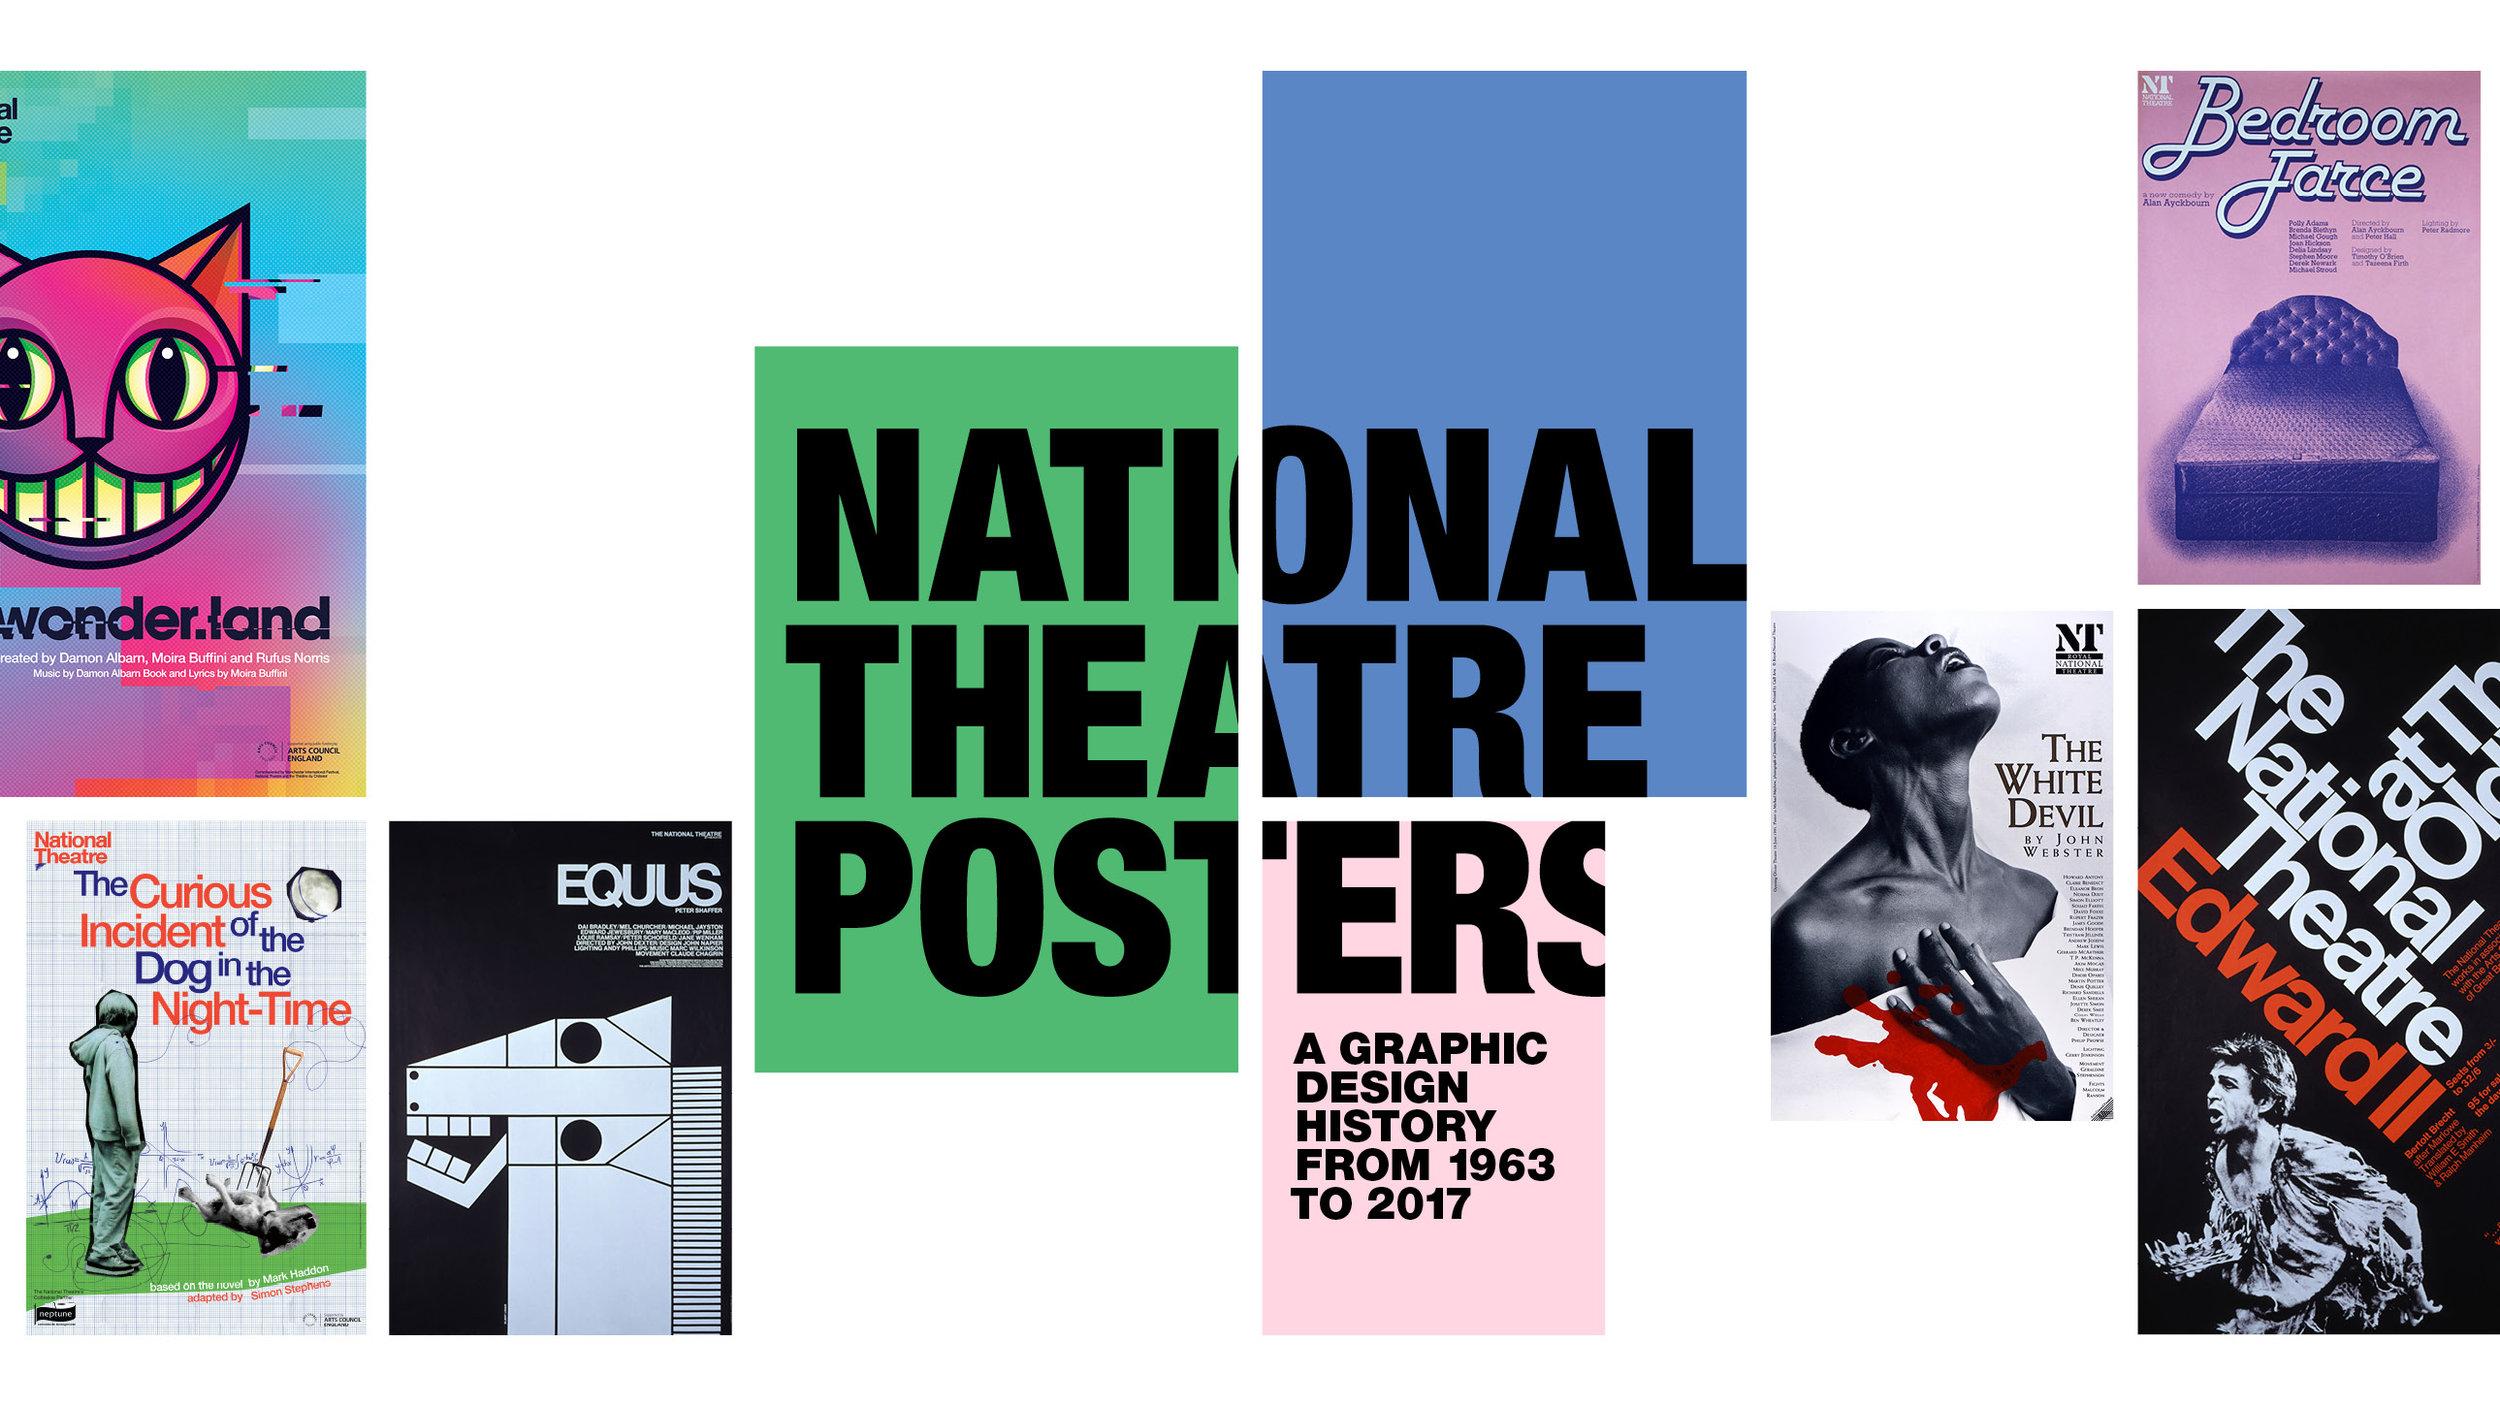 ntgds_ec_ntposters_exhibition_2578x1450px_banner.jpg